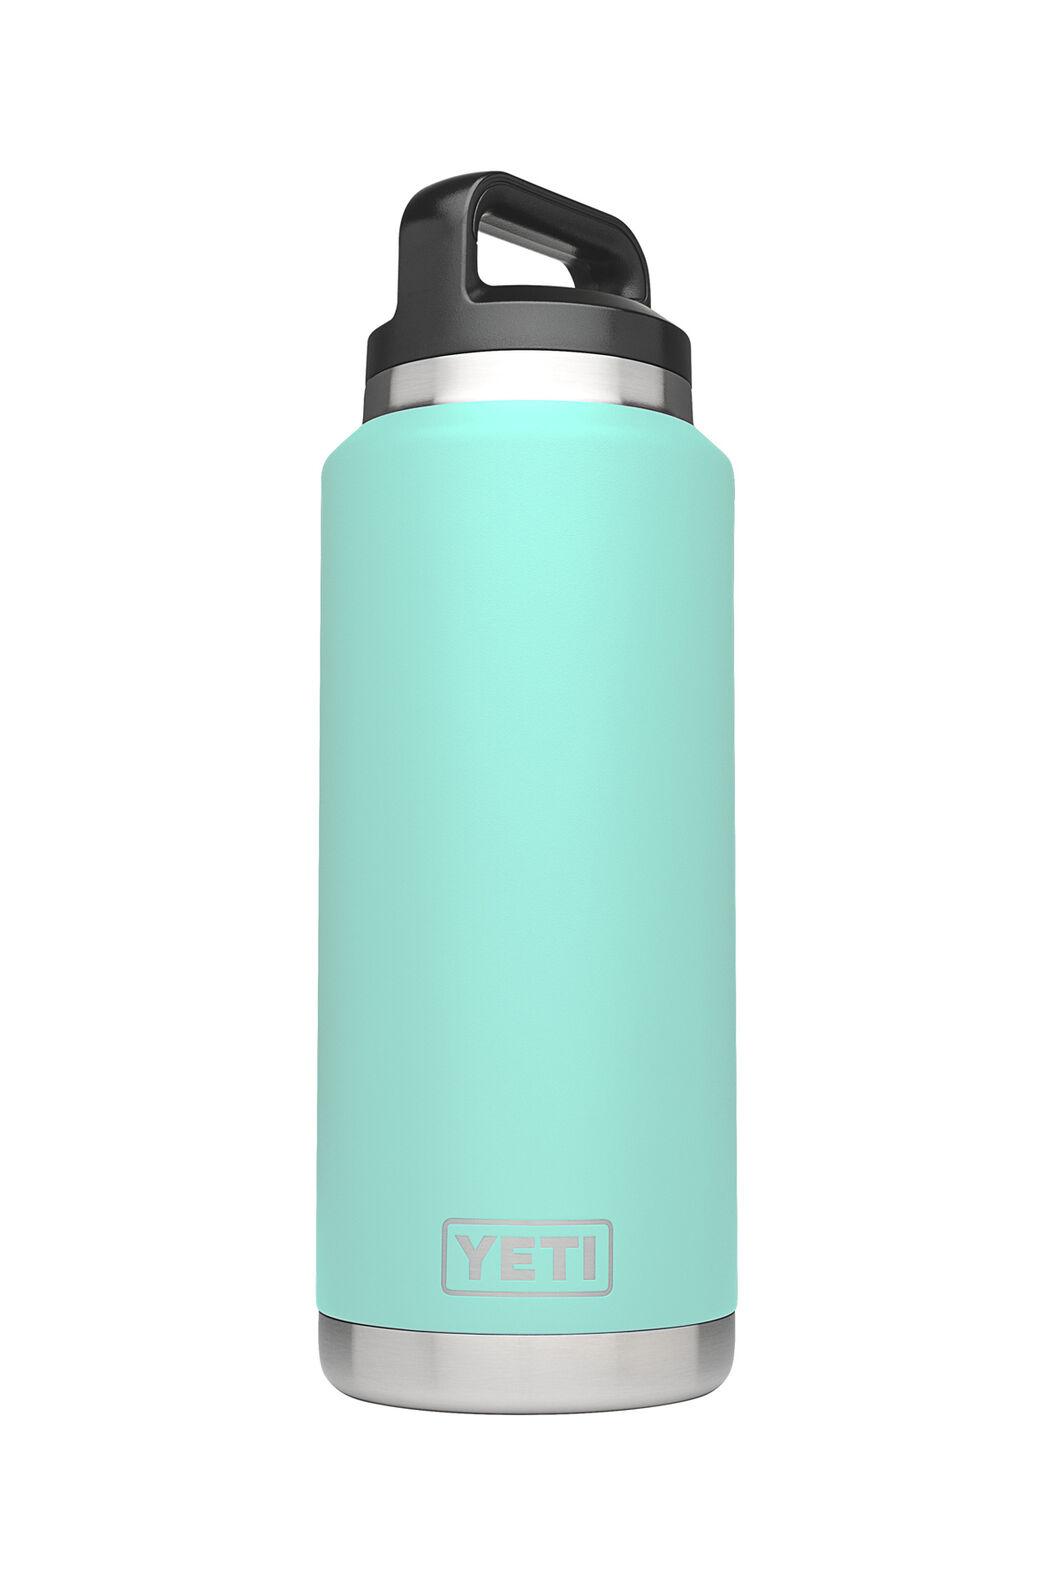 Yeti Rambler Drink Bottle Stainless Steel 36oz, SEAFOAM, hi-res